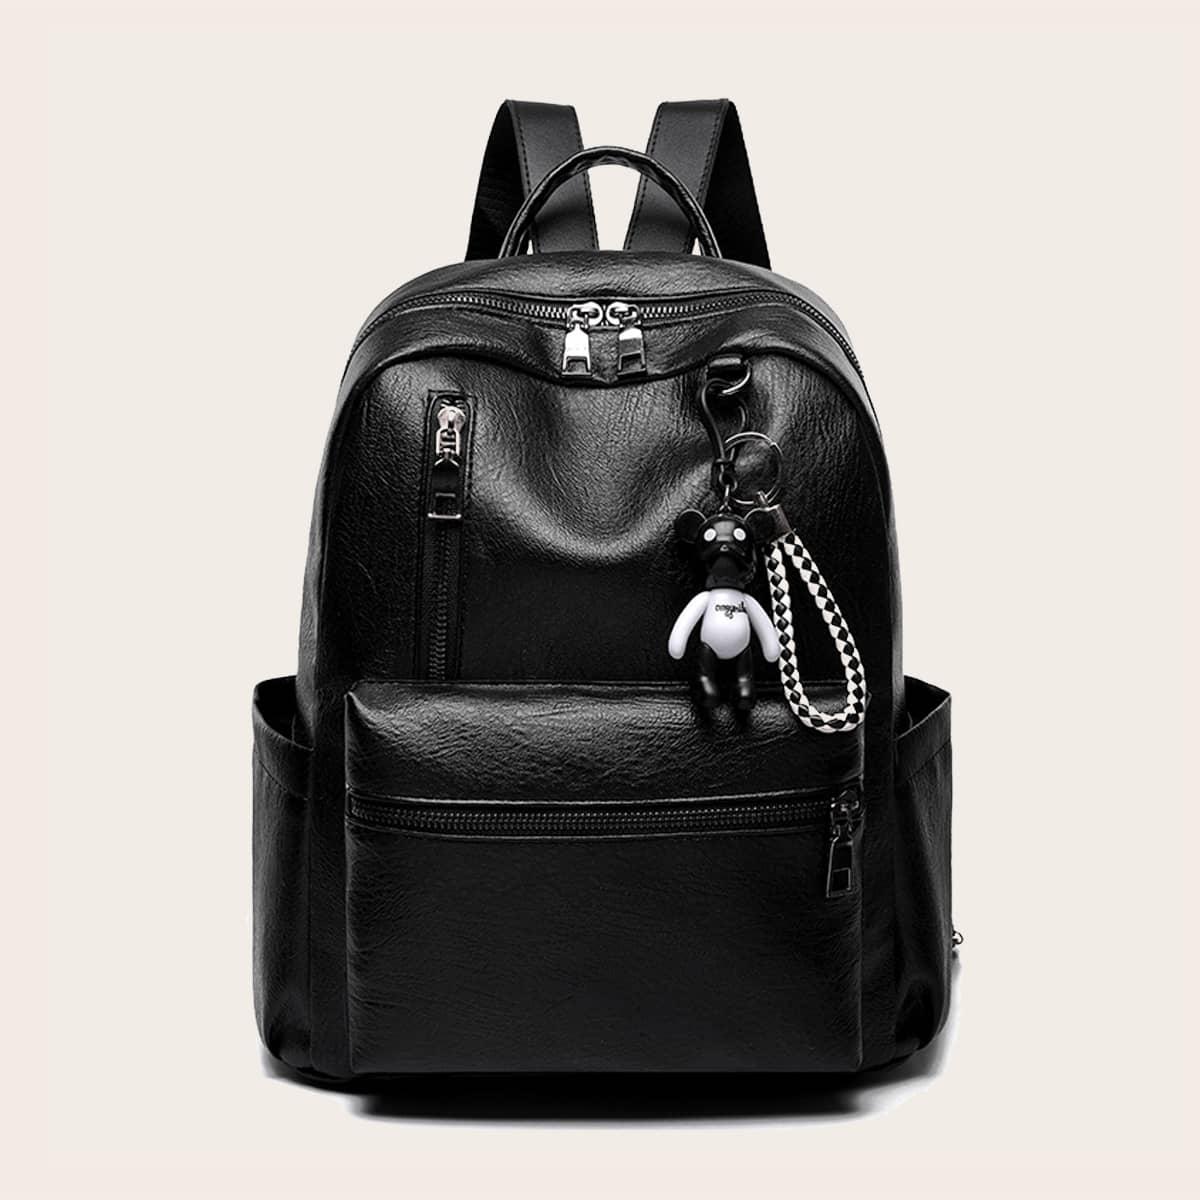 Минималистский рюкзак с подвеской